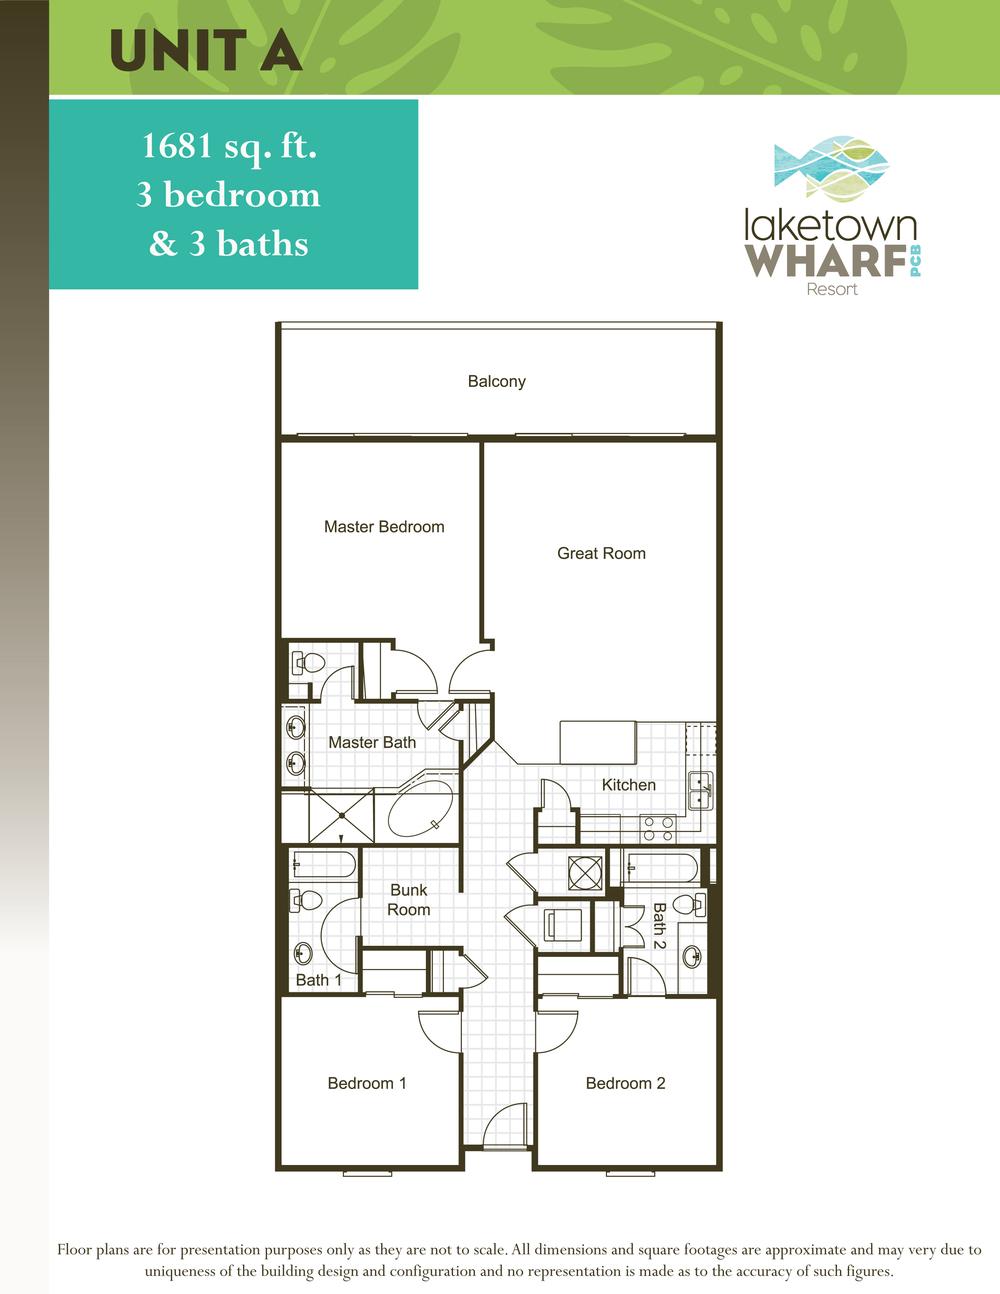 LTW+Unit+A+Floor+Plan+Edited-01.jpg